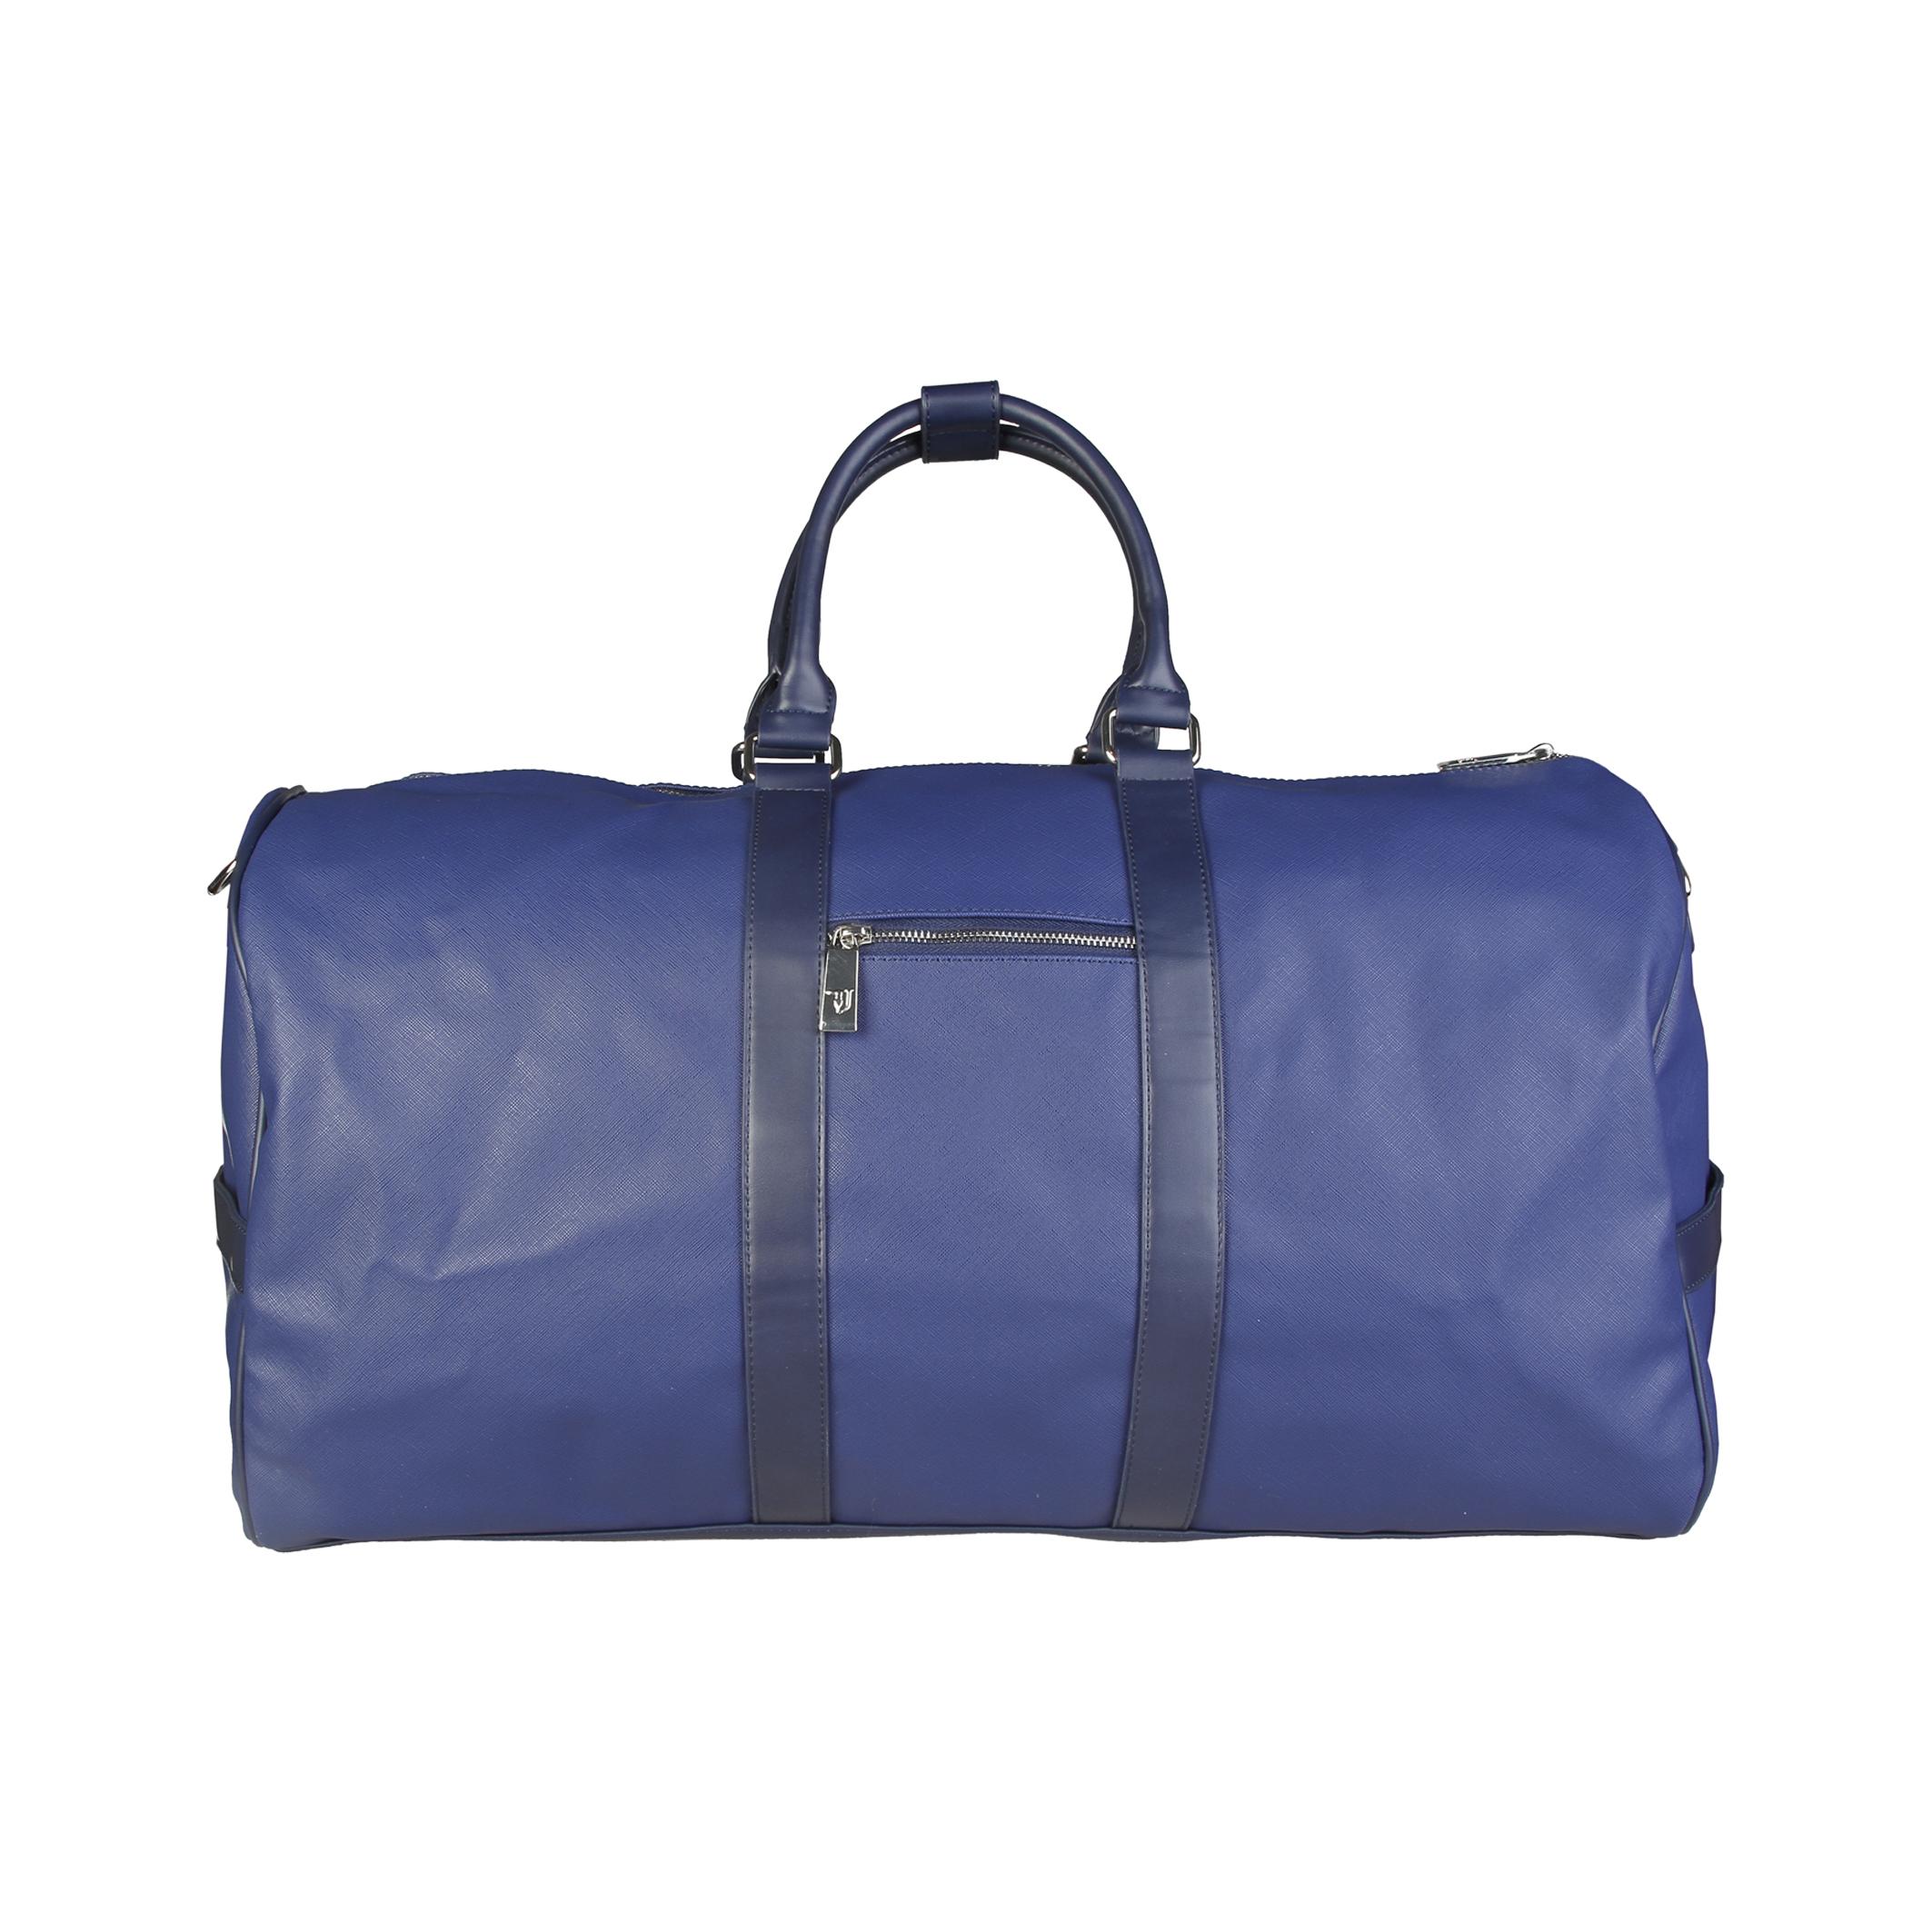 Maroquinerie  Trussardi 71B993T blue